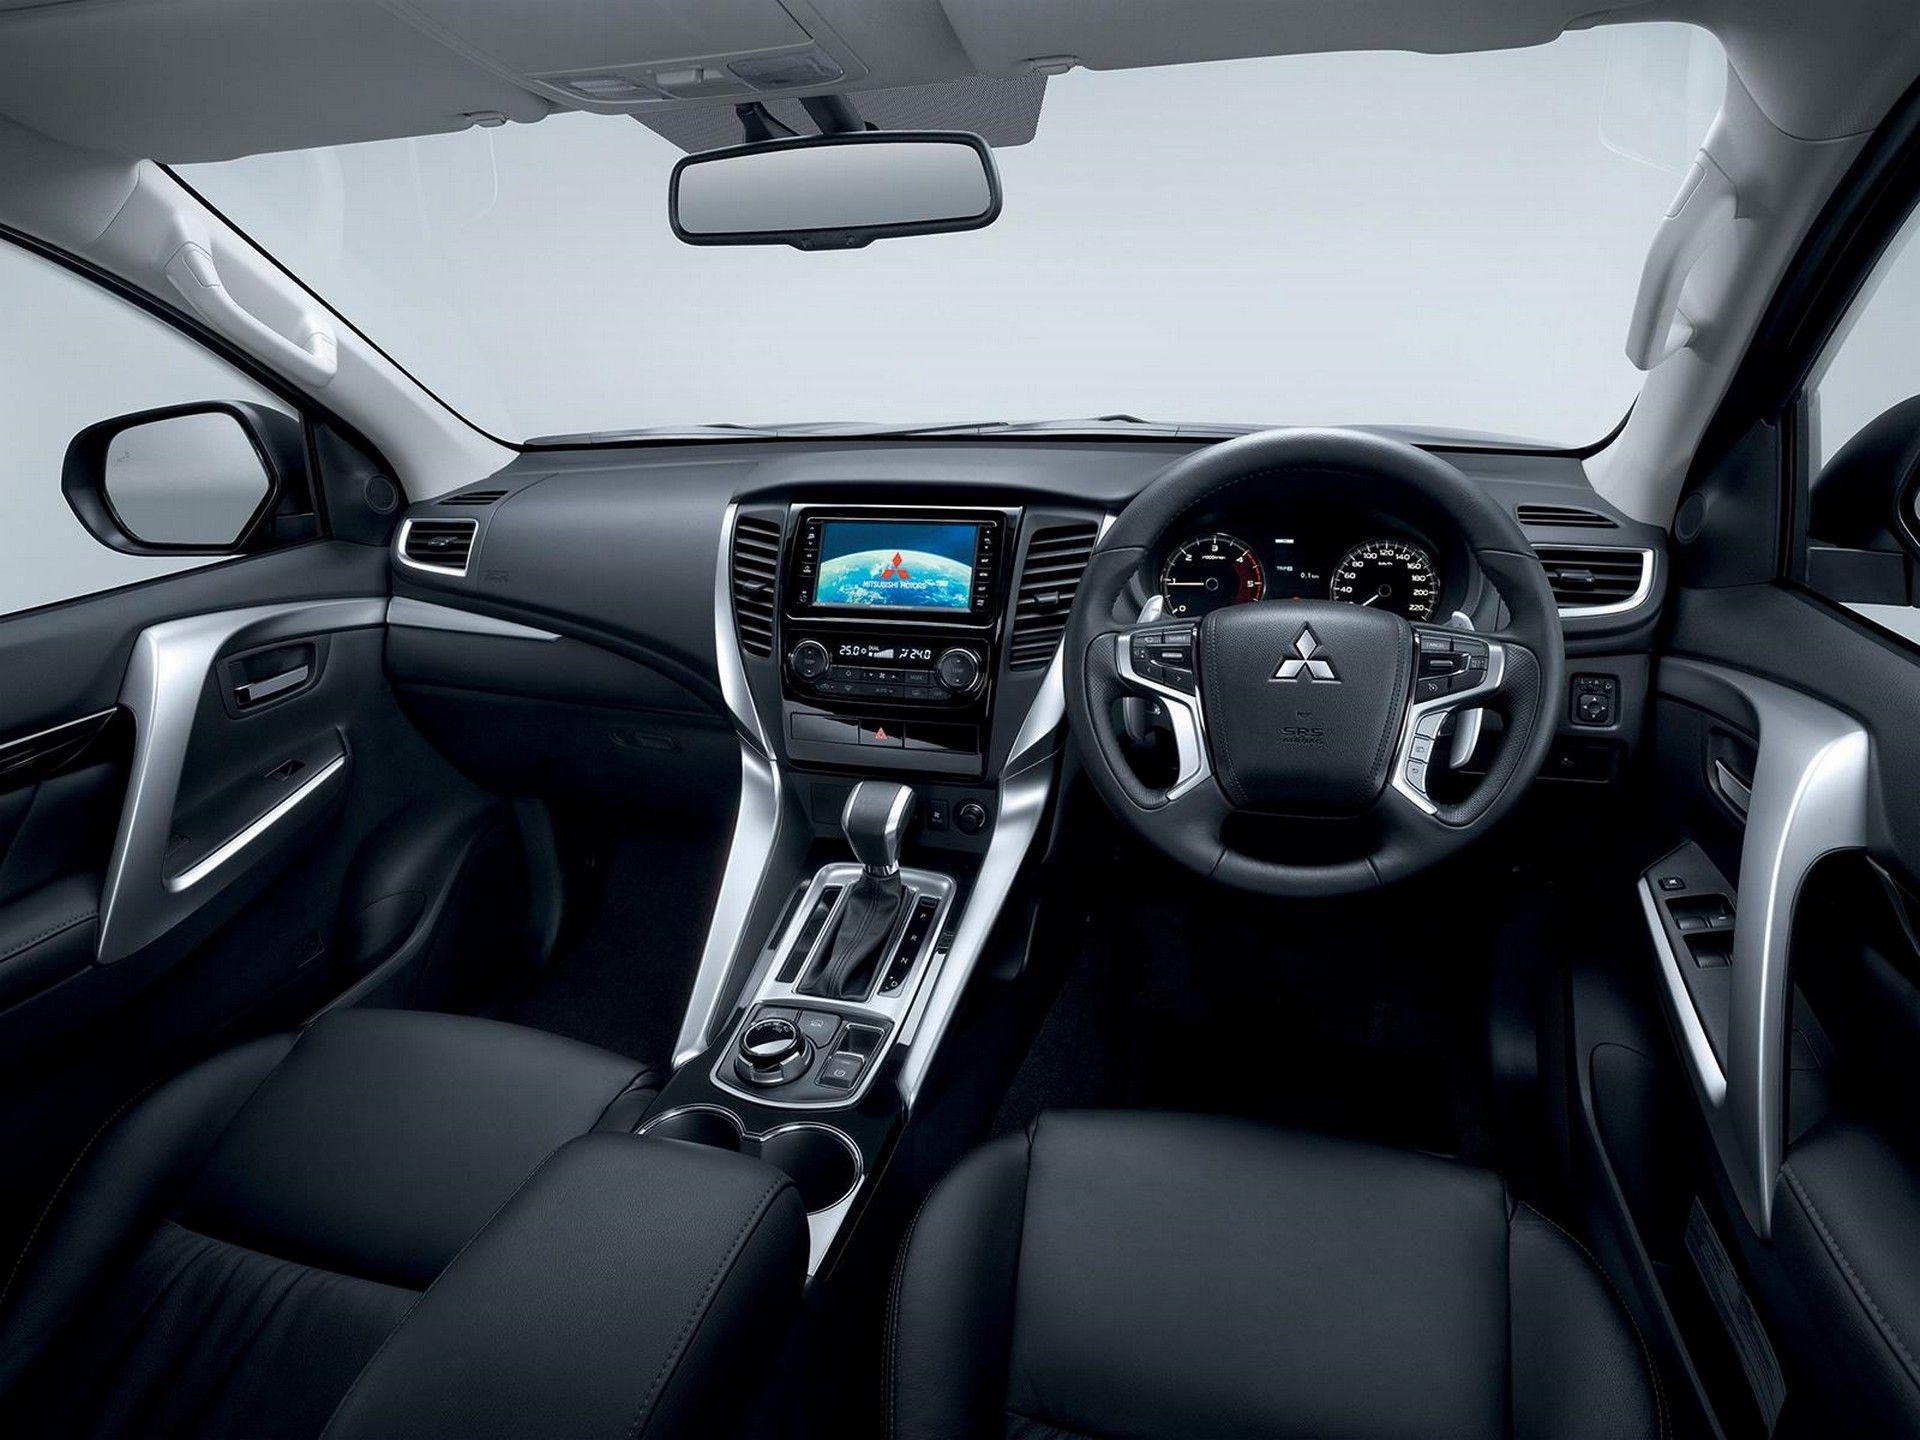 2020 Mitsubishi Pajero Sport, Interior, Price >> 2020 Mitsubishi Montero Sport Interior Usa Cars And Trucks Mobil